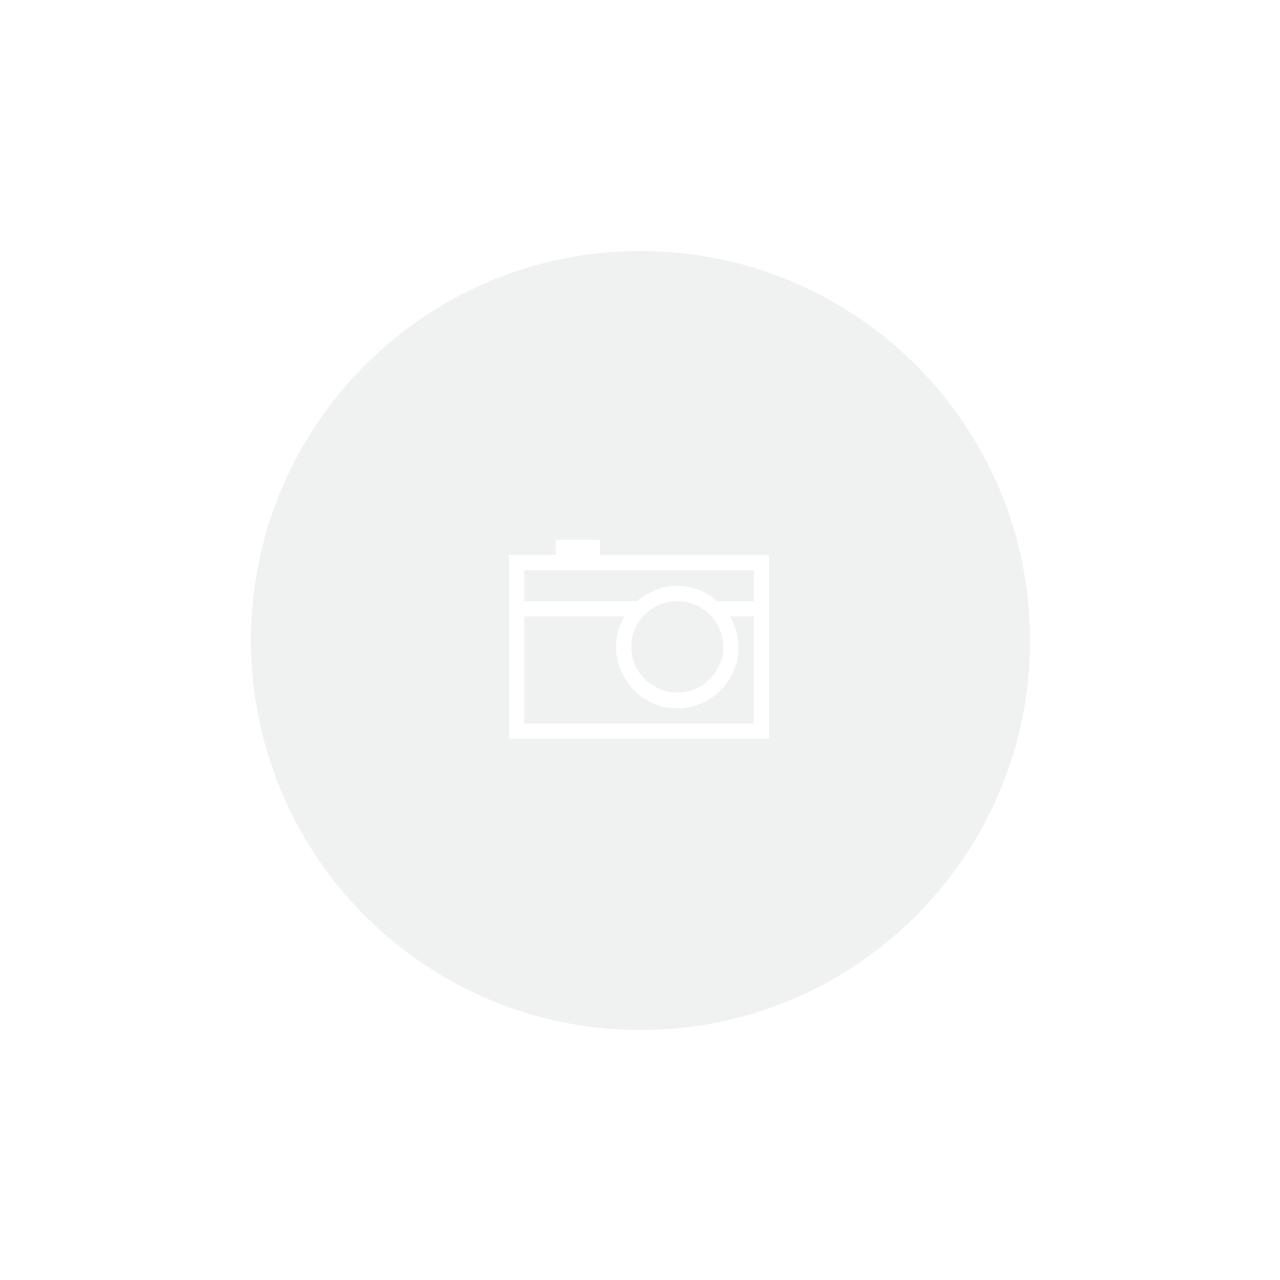 bolero-bordado-rafinha-gadelha-004if18